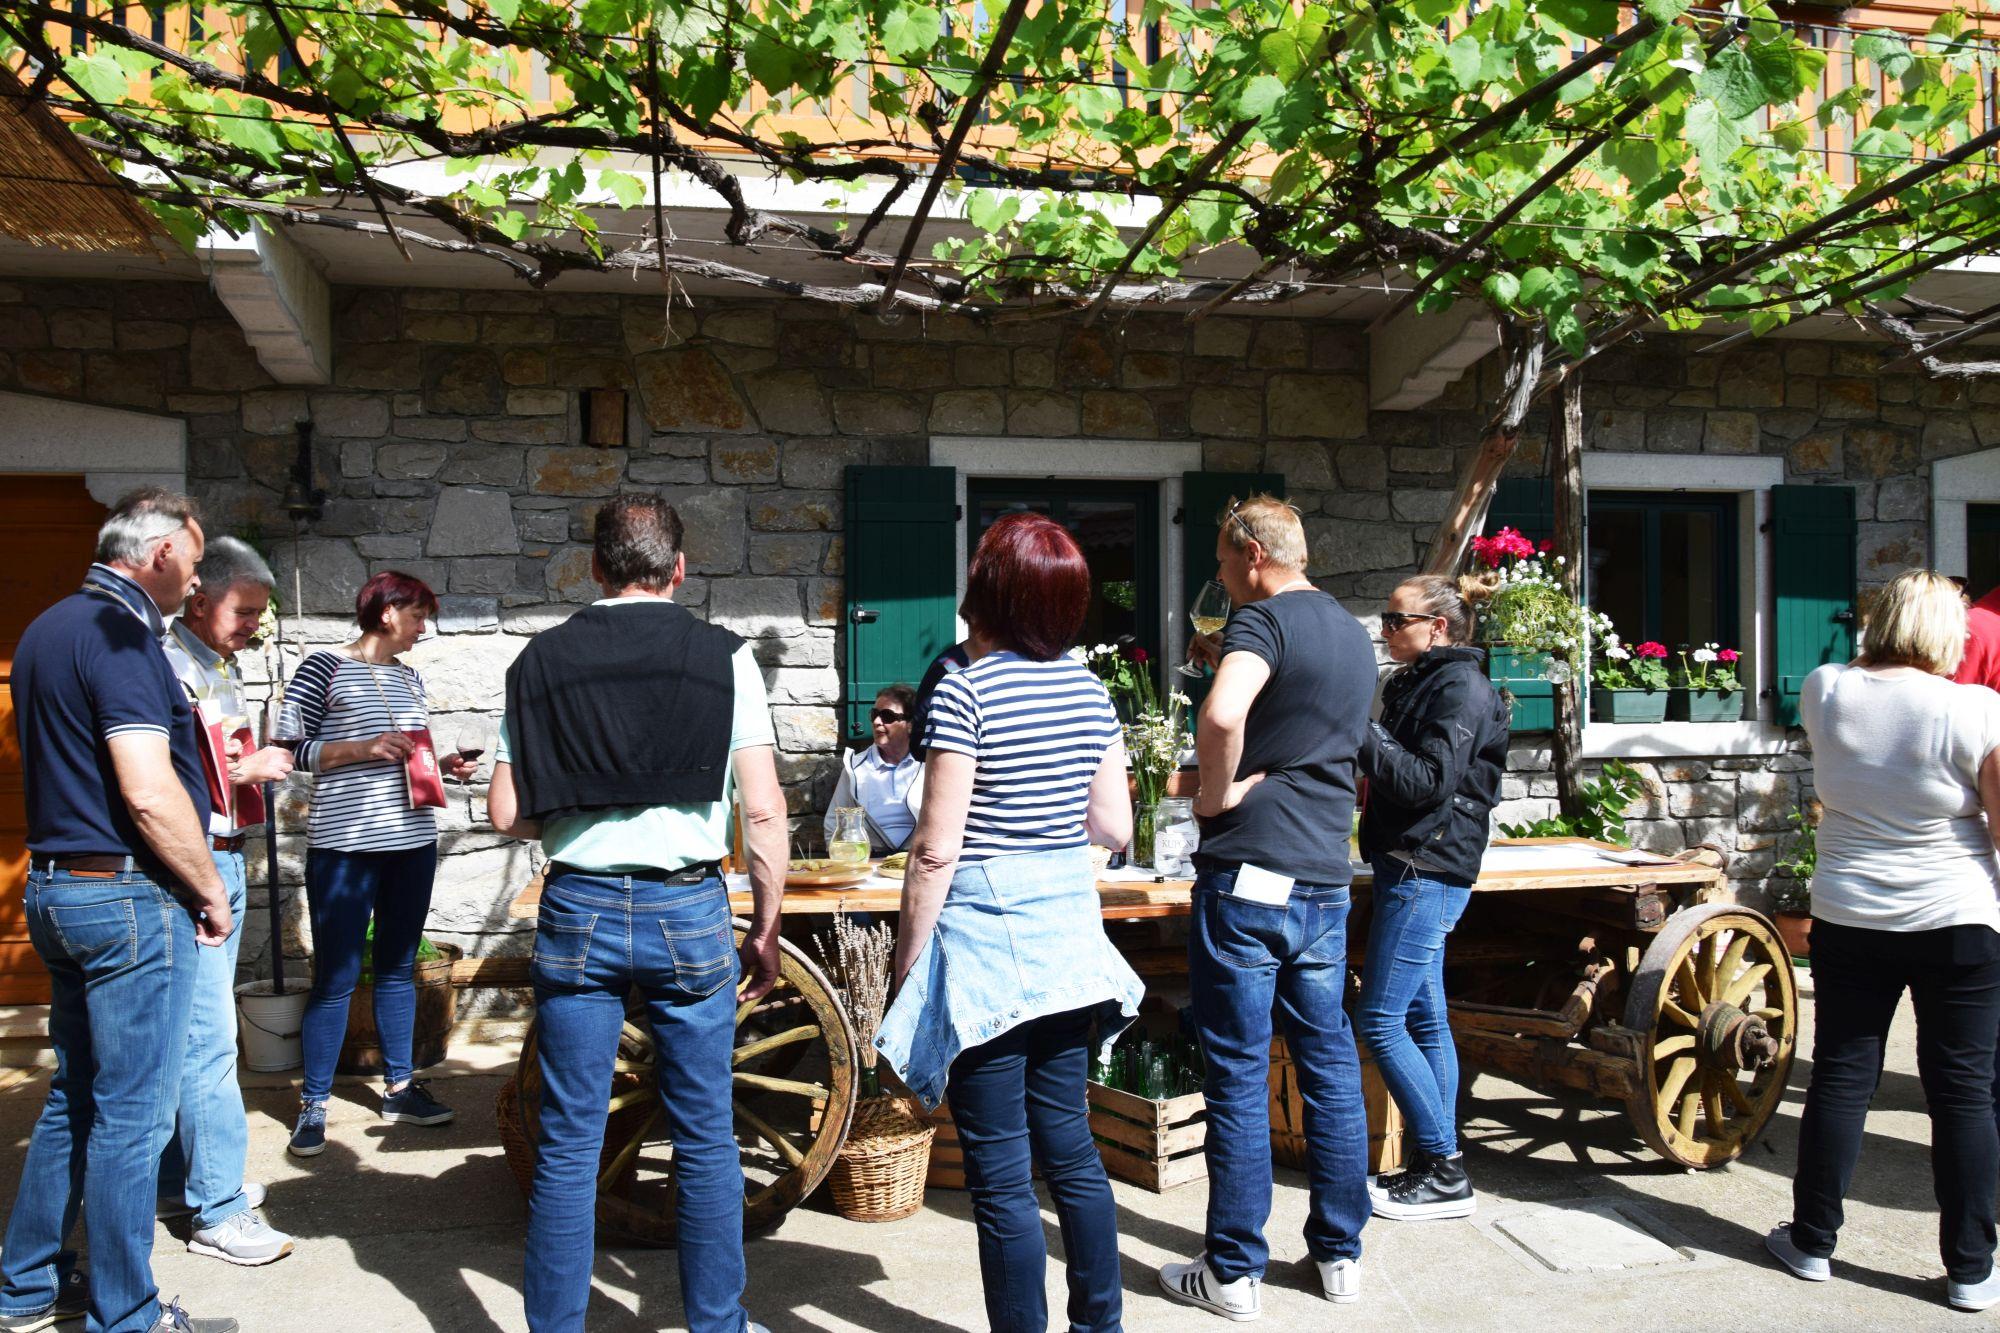 Wine festival patrons enjoy their wines